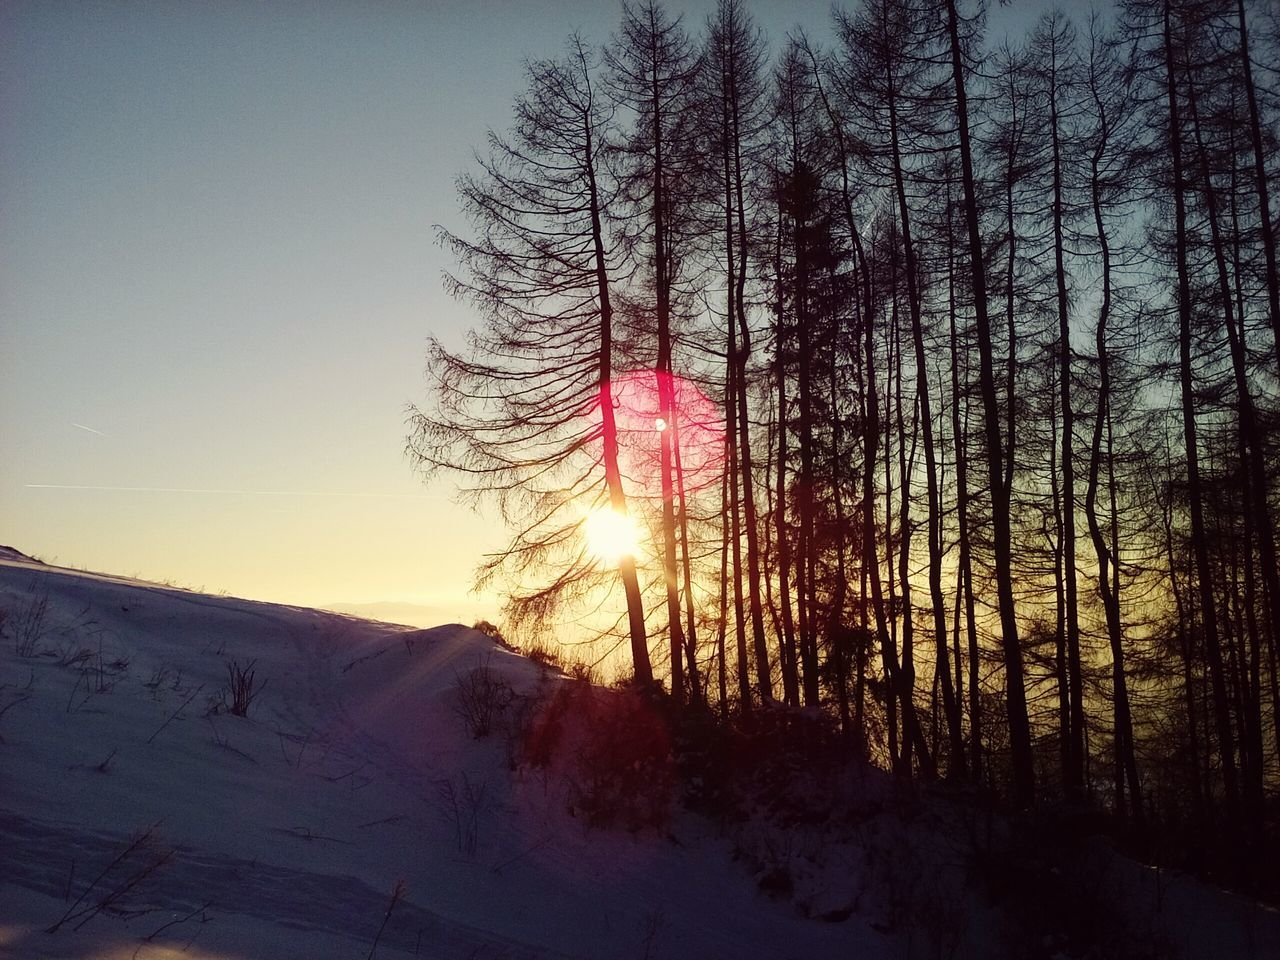 Winter Scenery Winter Sunset Beautiful Nature Bare Trees Group Of Trees Conifers Sunglare Golden